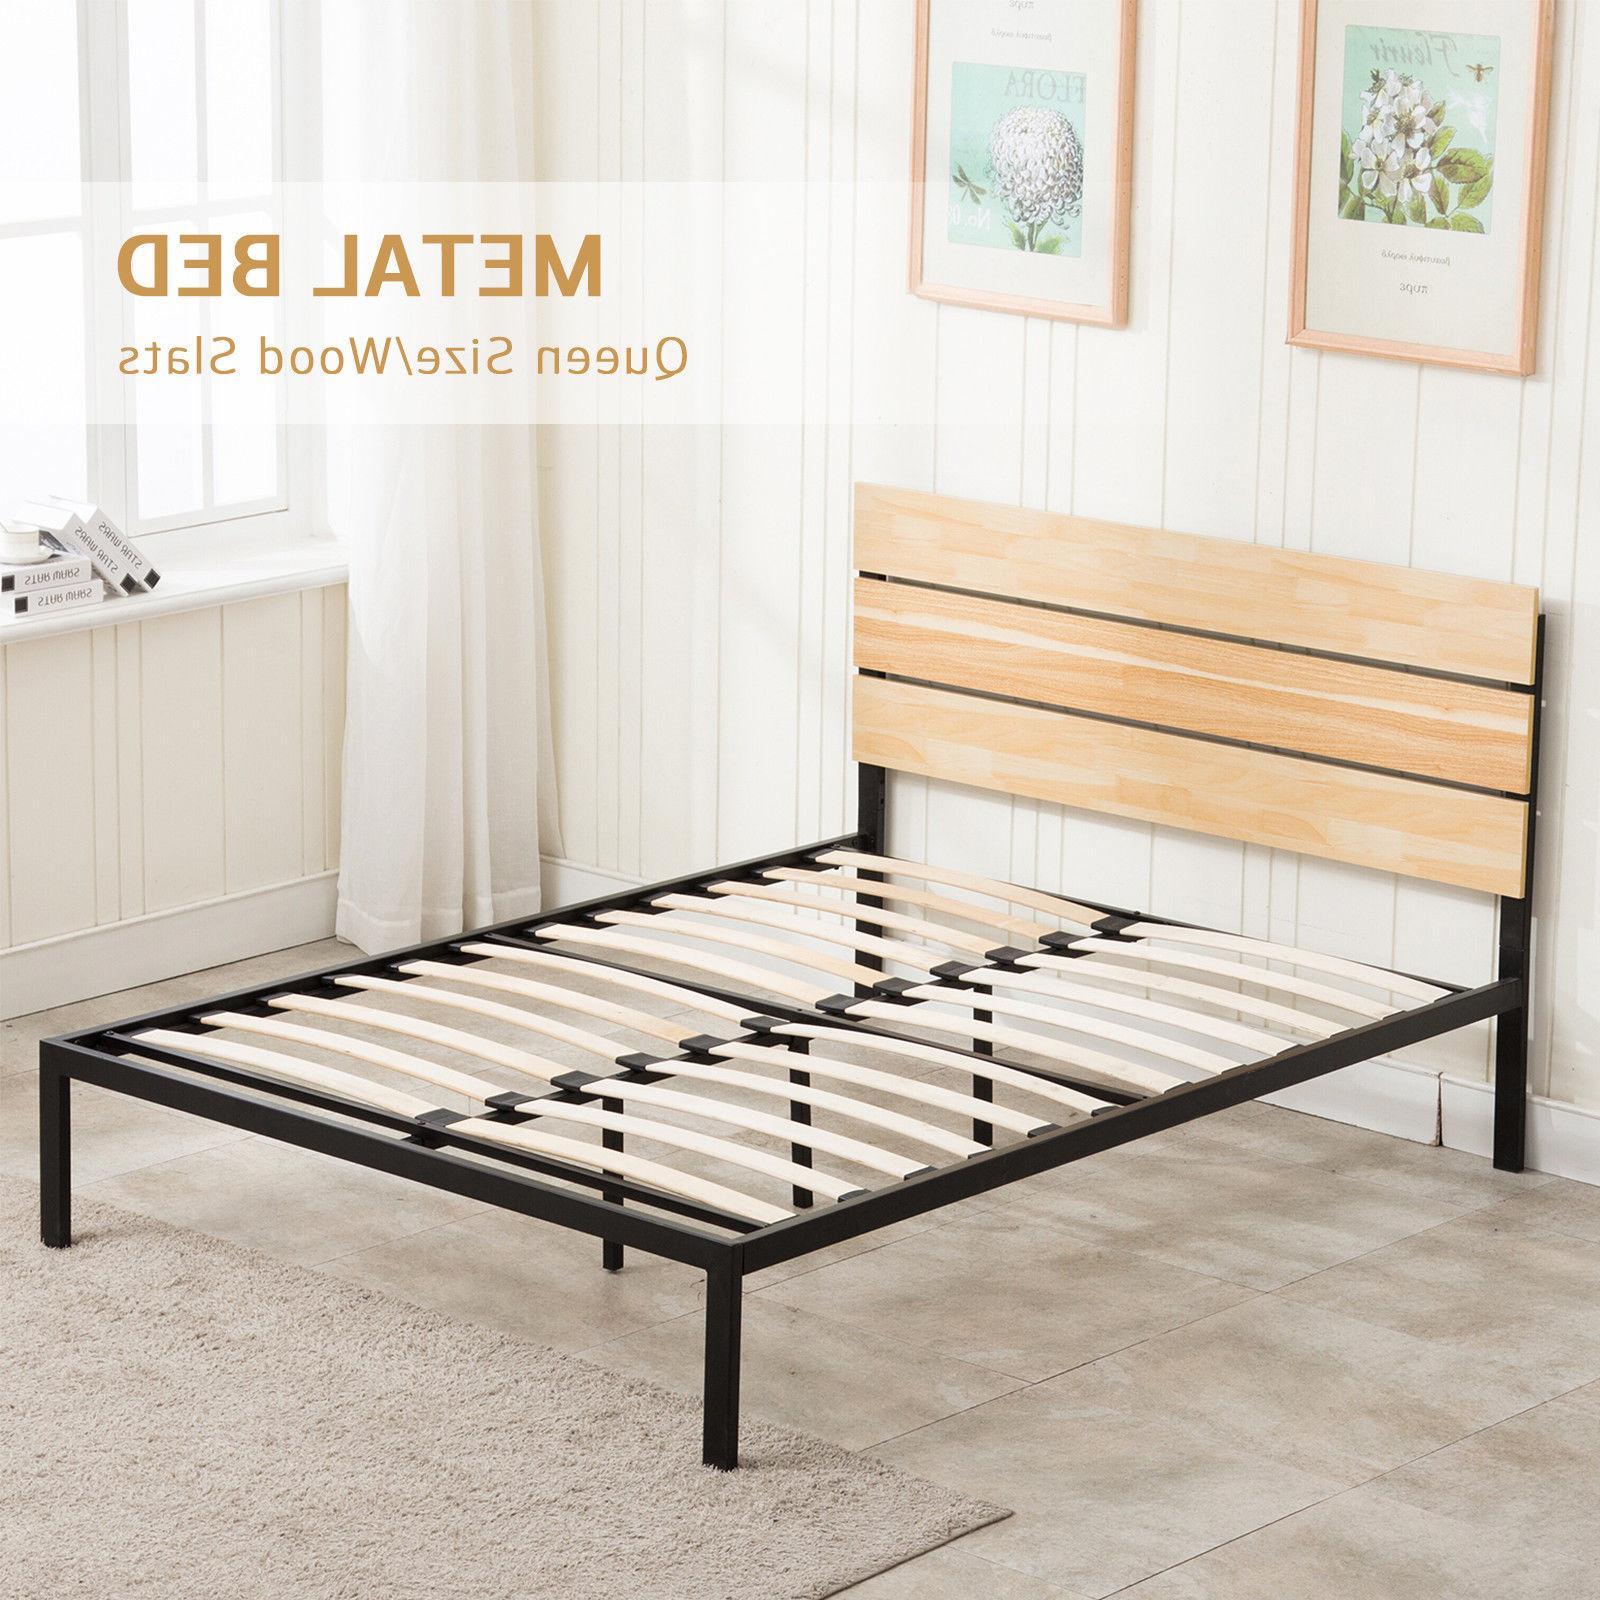 Modern White Unit Cabinet Table w/ LED Shelves